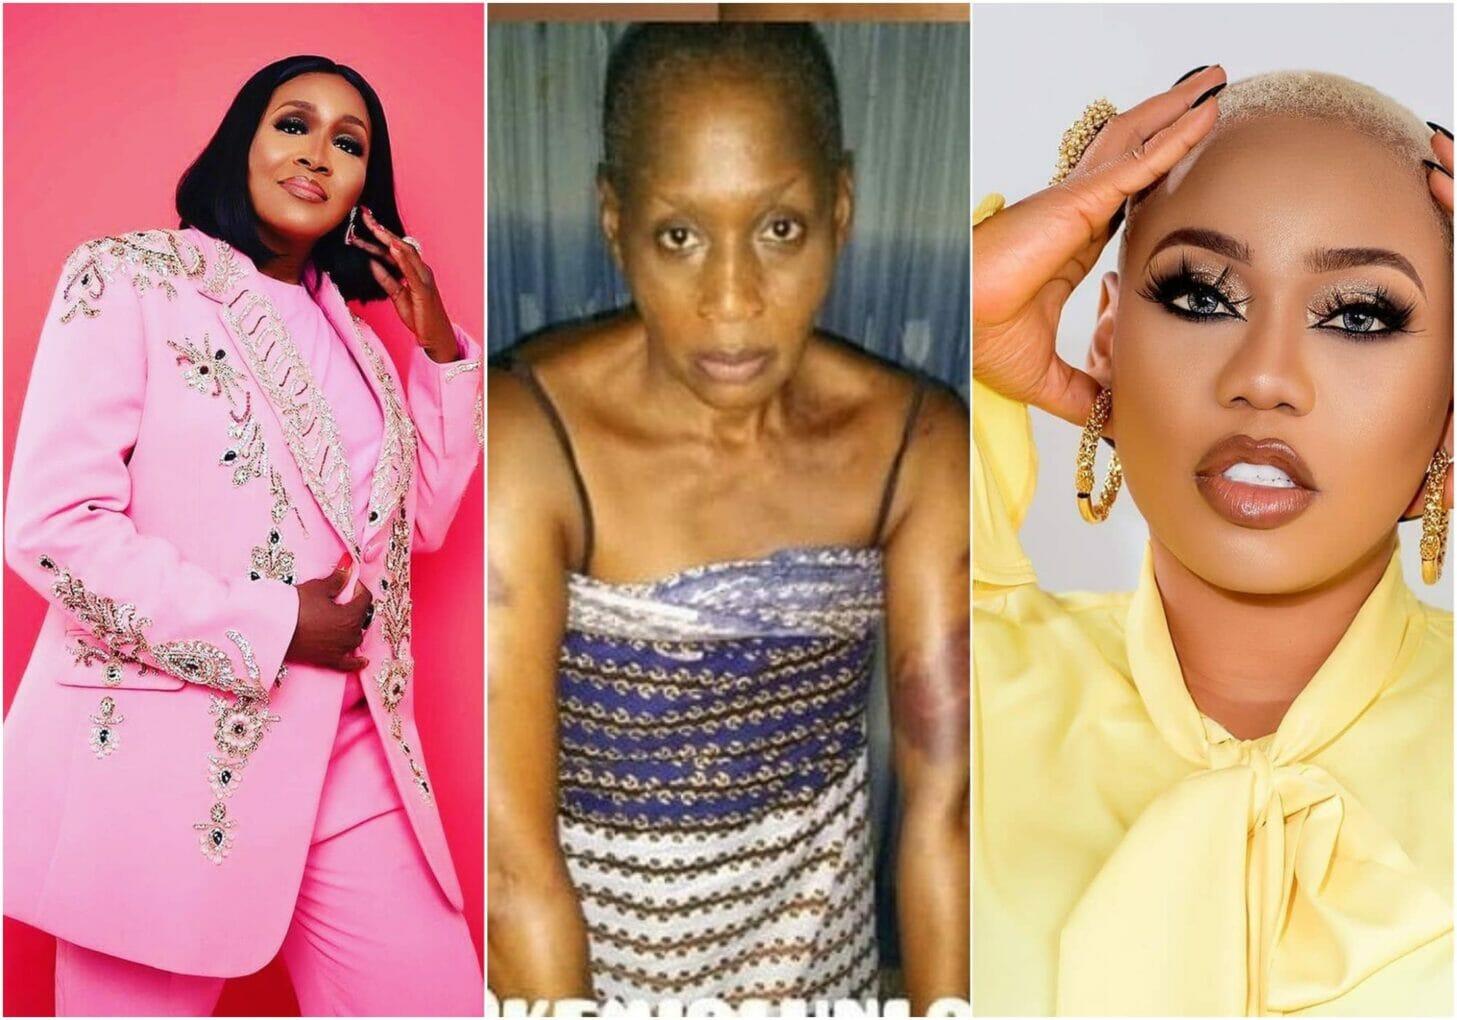 'You changed my life' - Kemi Olulonyo showers prayer on Toyin Lawani